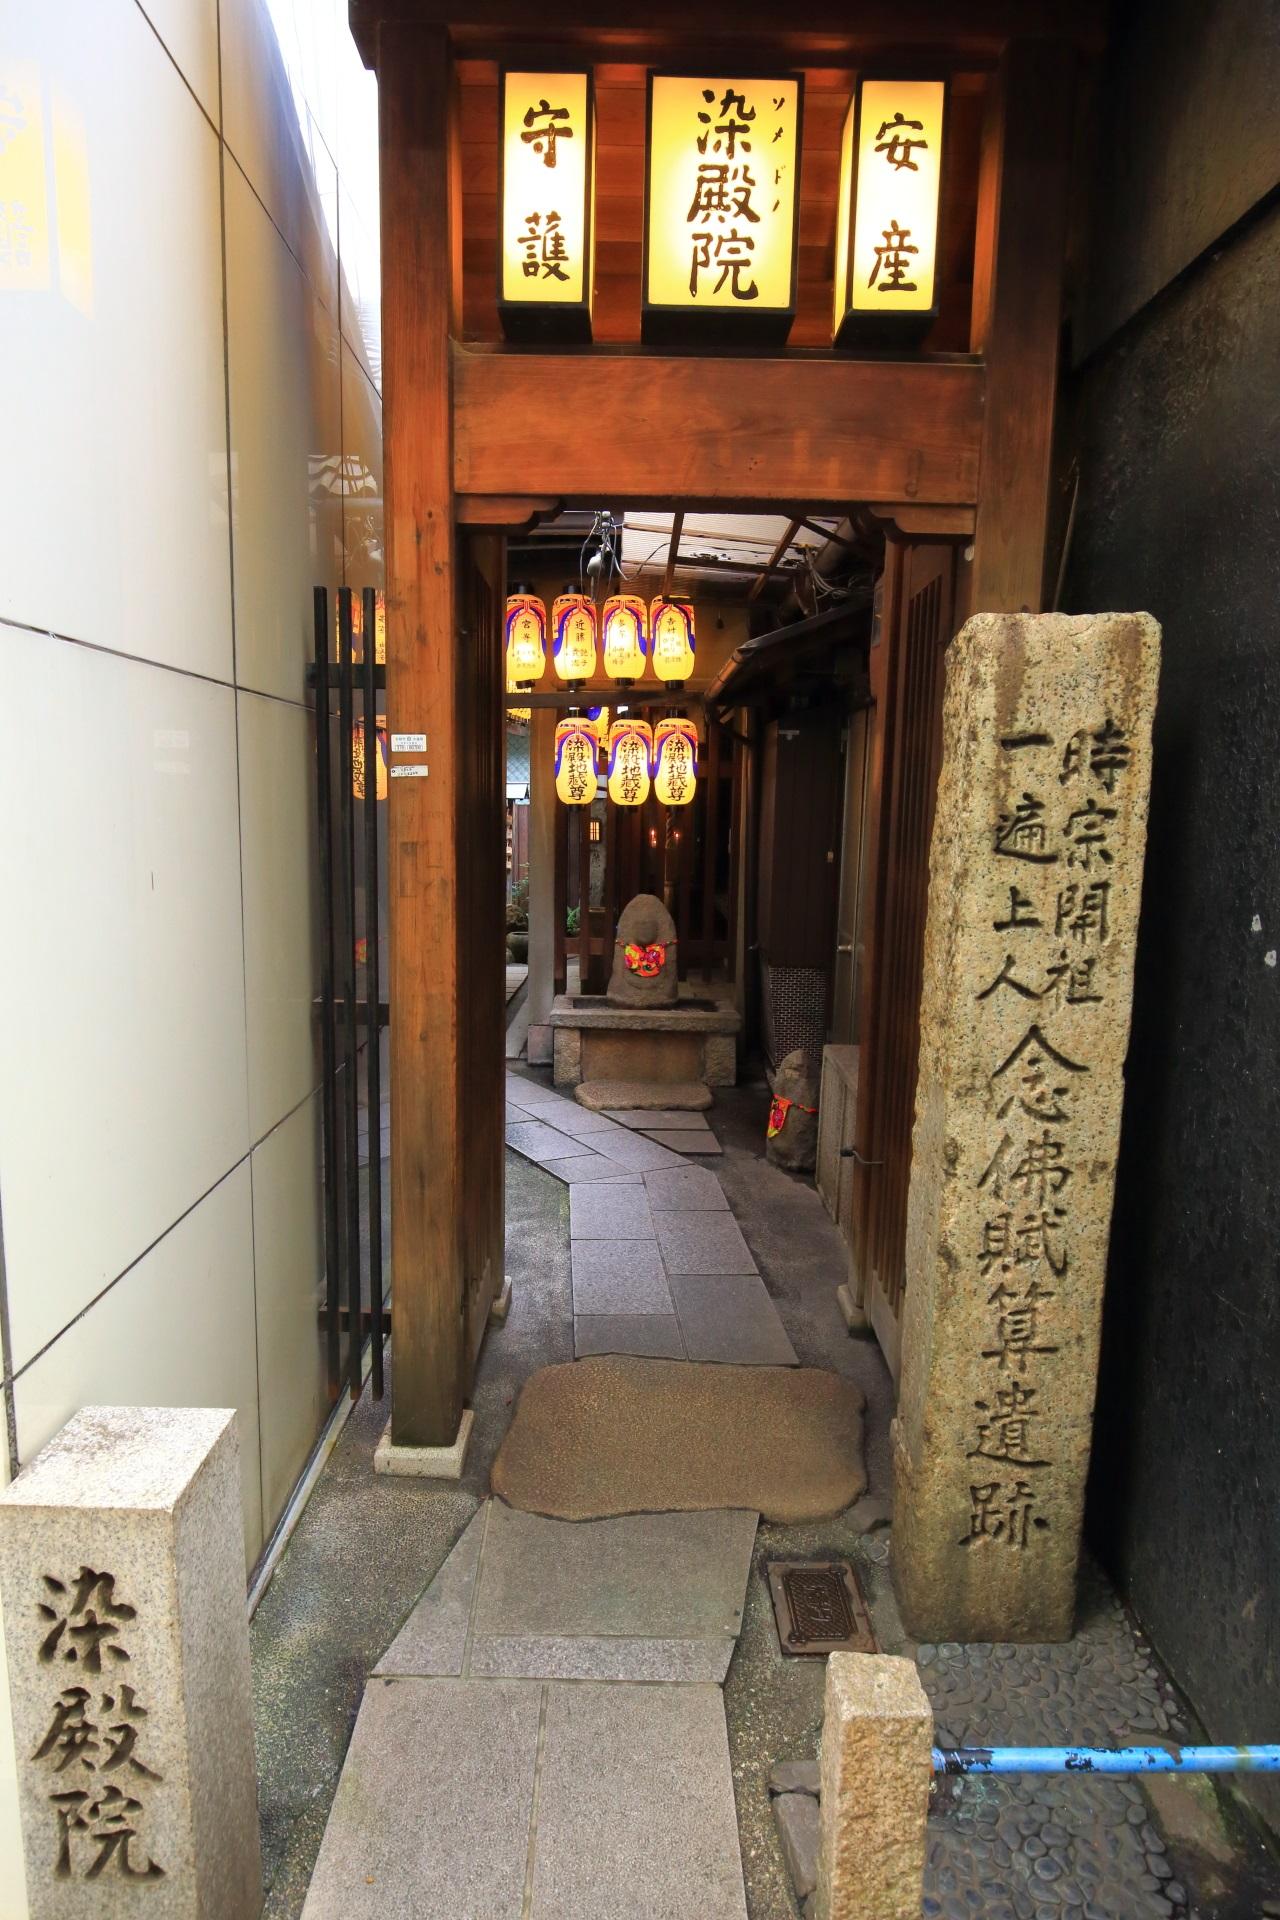 染殿院(染殿地蔵)の新京極通側の入口